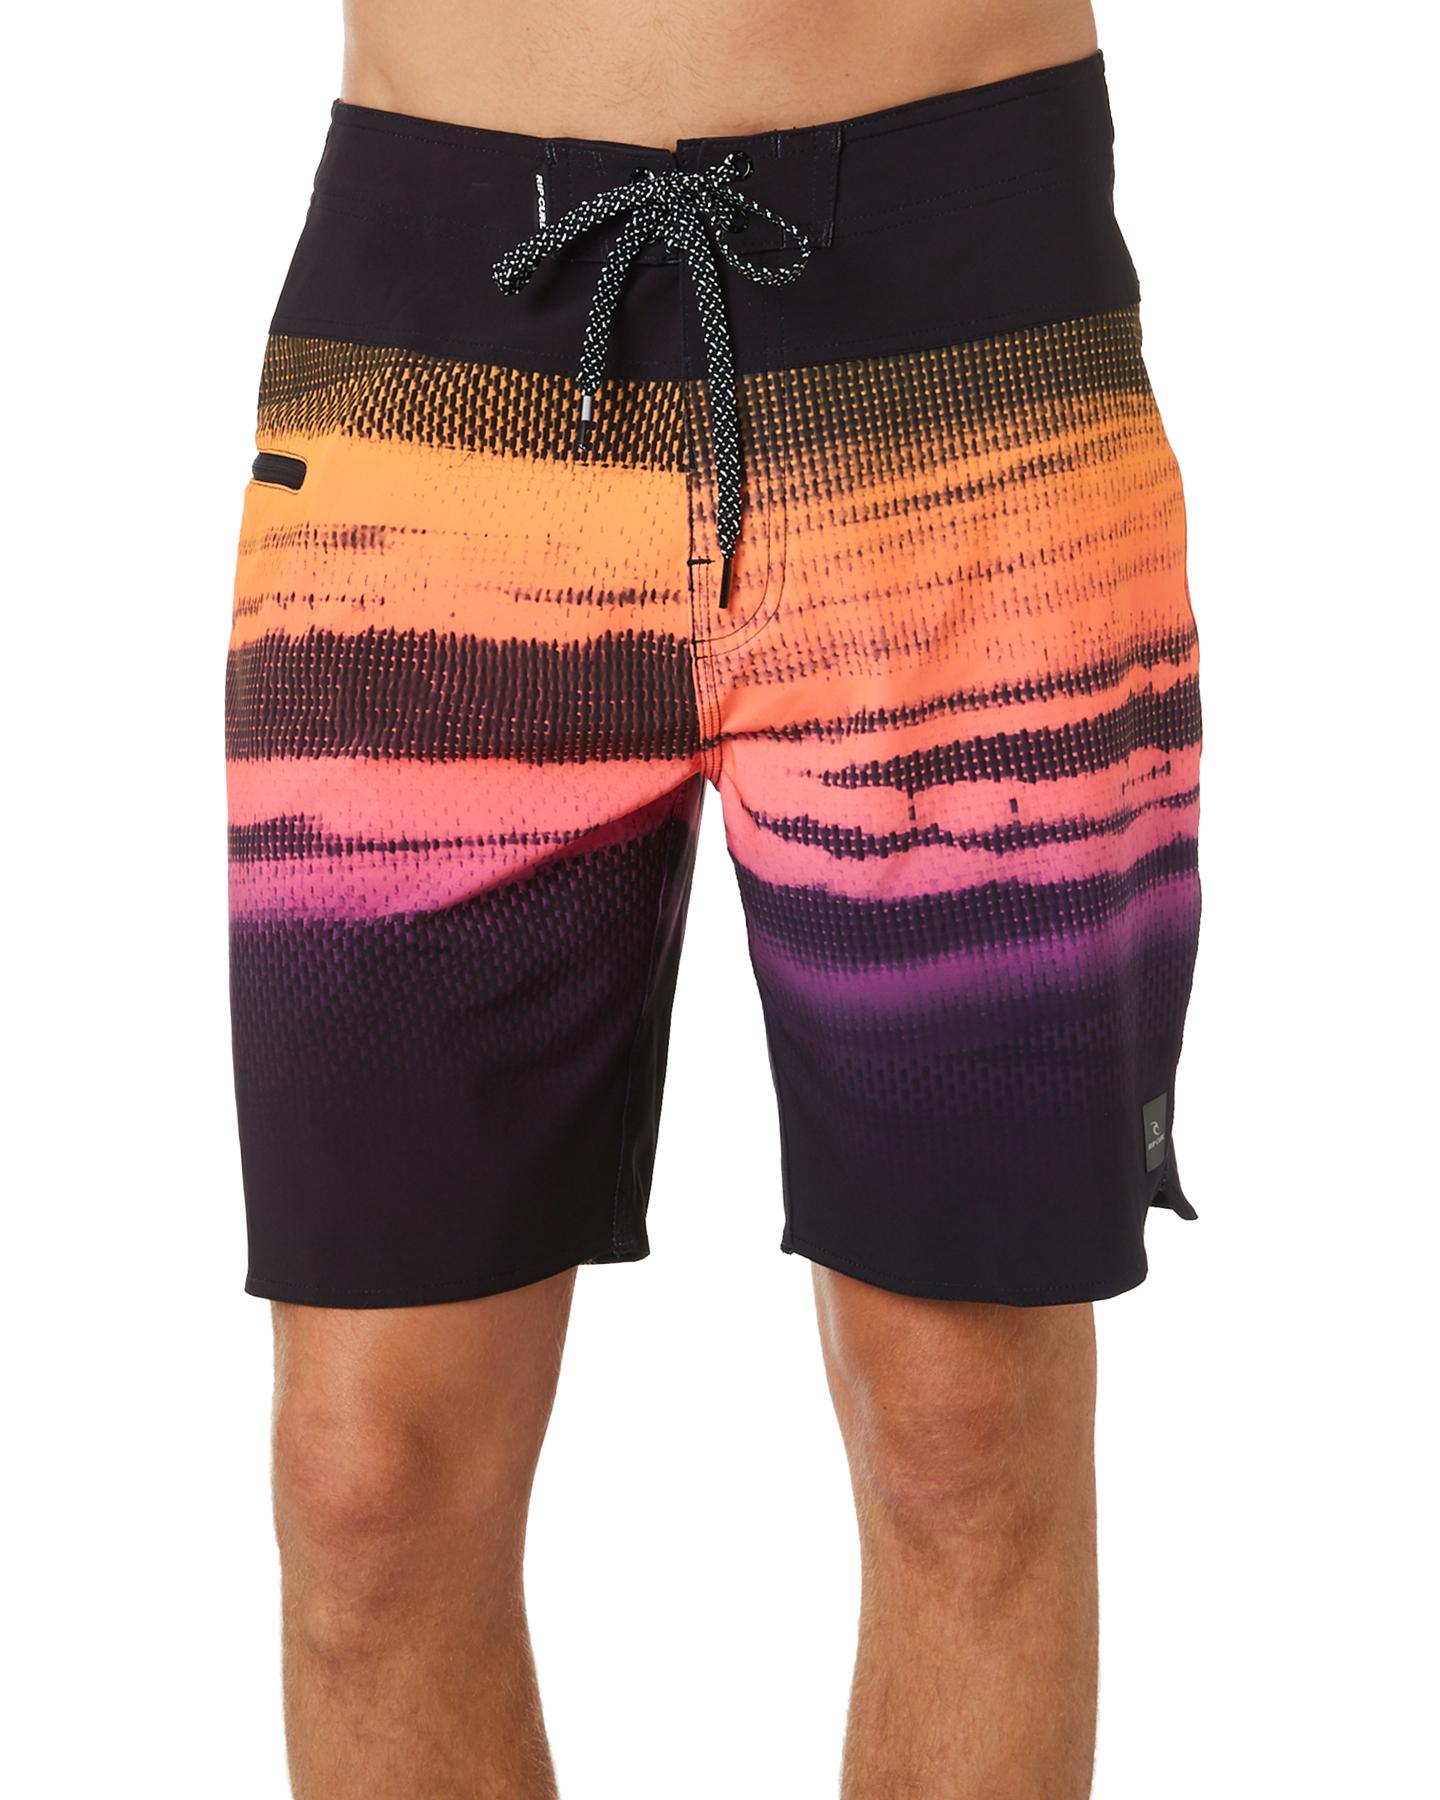 Rip Curl Mens Mirage Wilko Resin Stretch Boardshorts Board Shorts